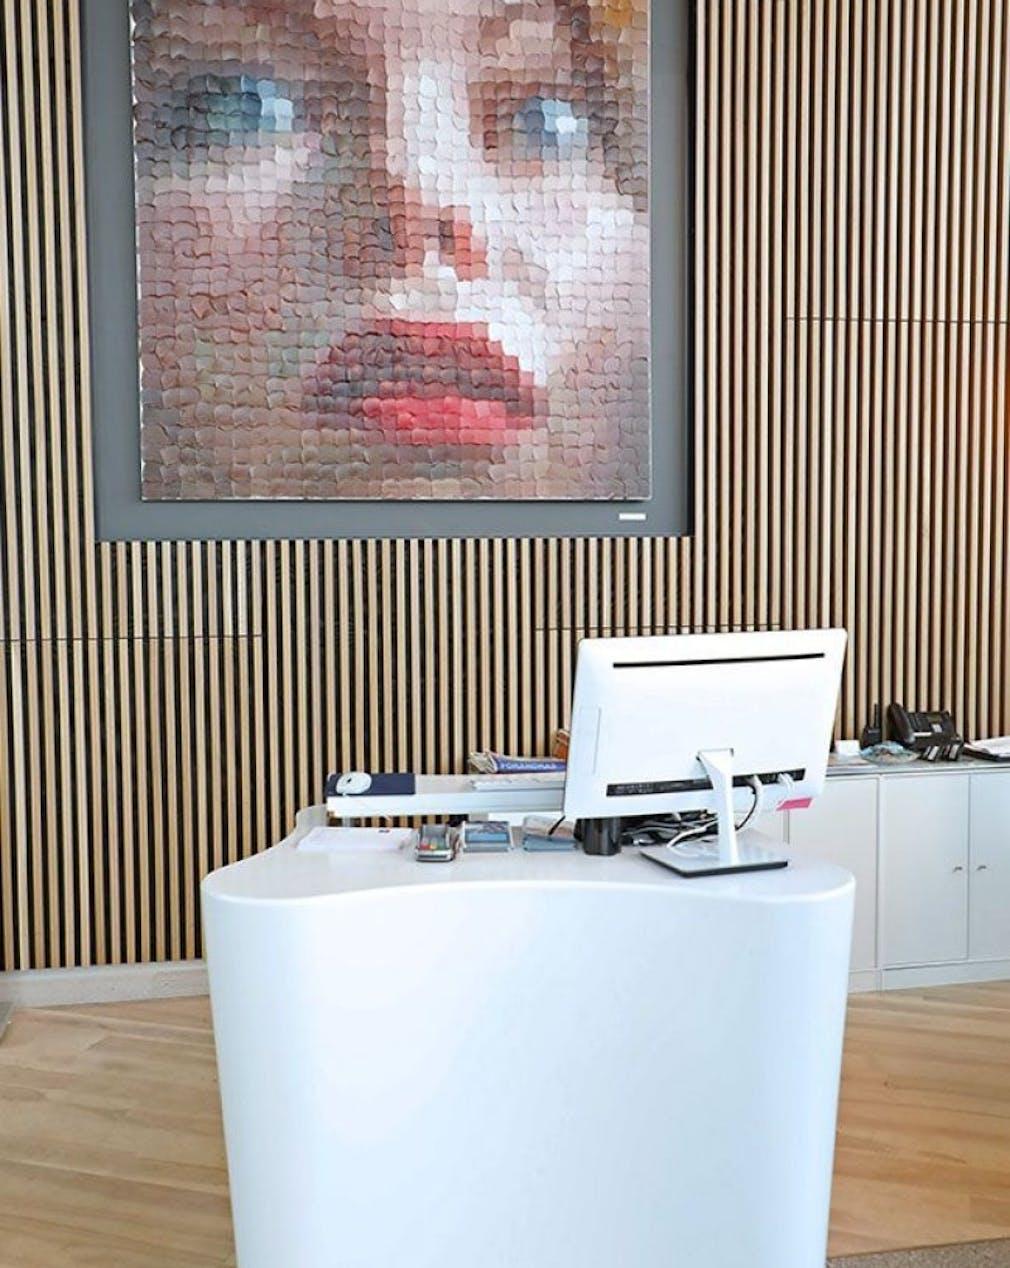 Clarion Hotel Helsinki Recepton Desk image